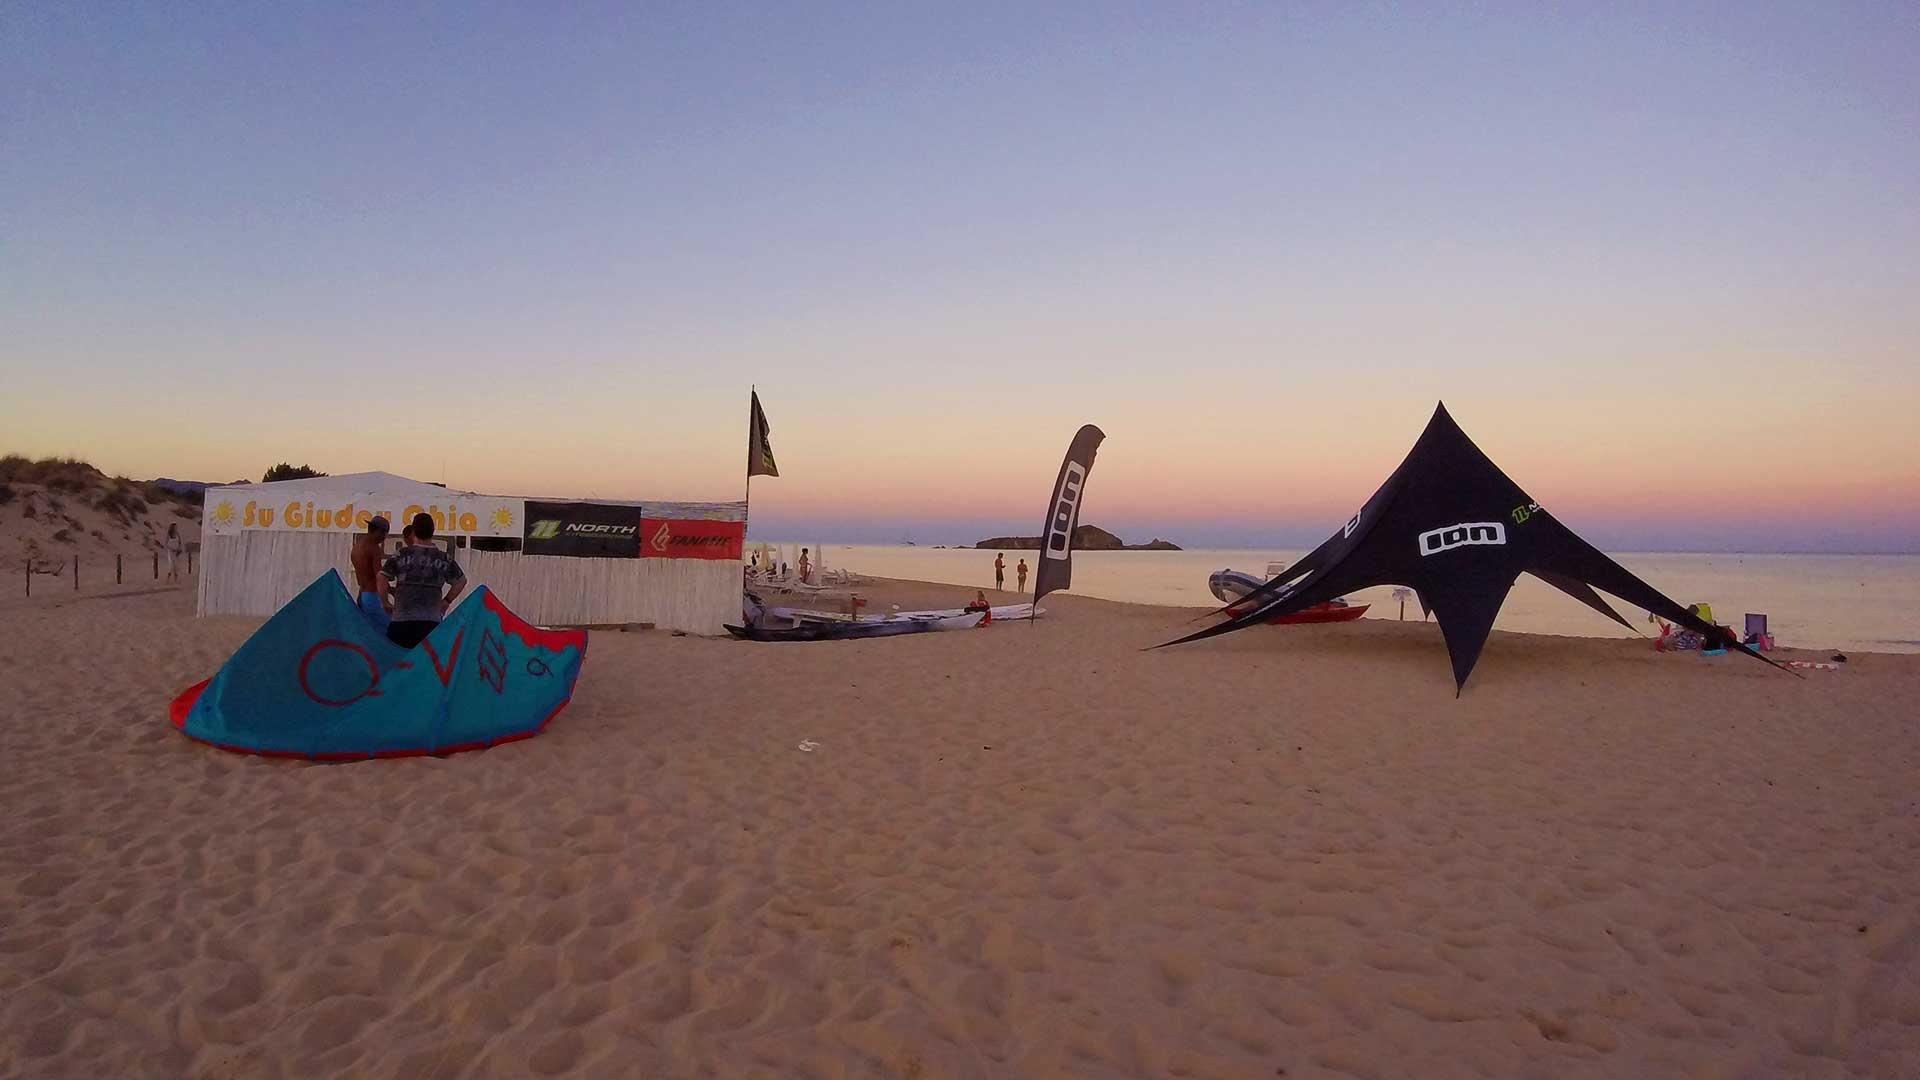 Stabilimento-Wind-Wave-Club